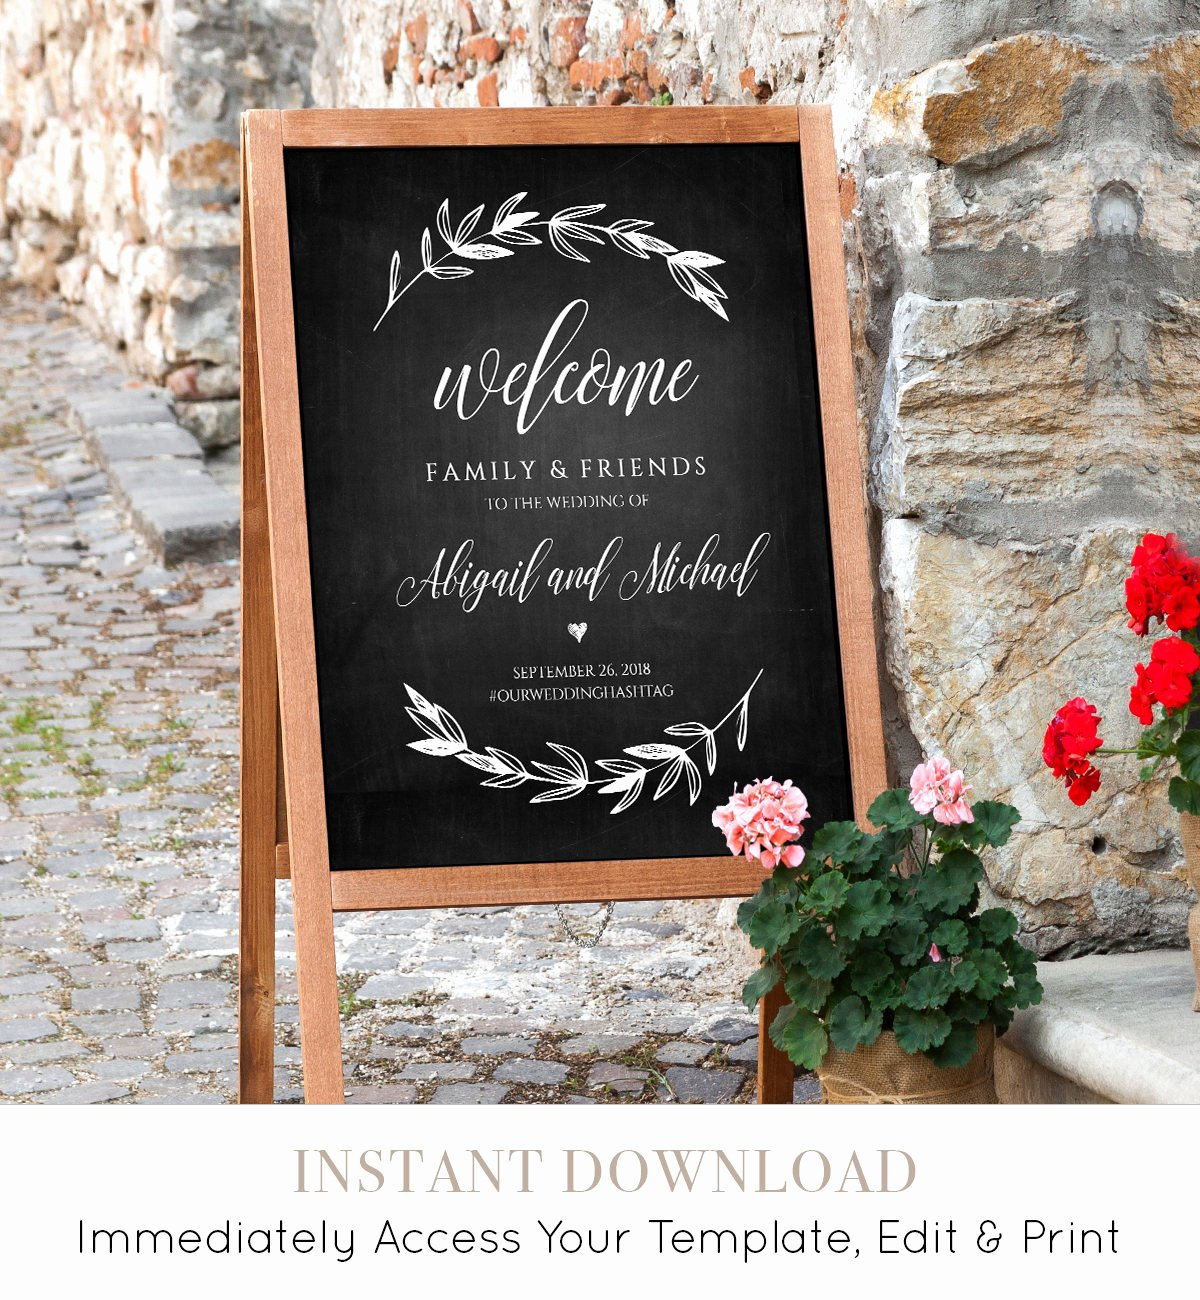 Wedding Welcome Sign Template Best Of Wedding Wel E Sign Template Chalkboard Wedding Poster